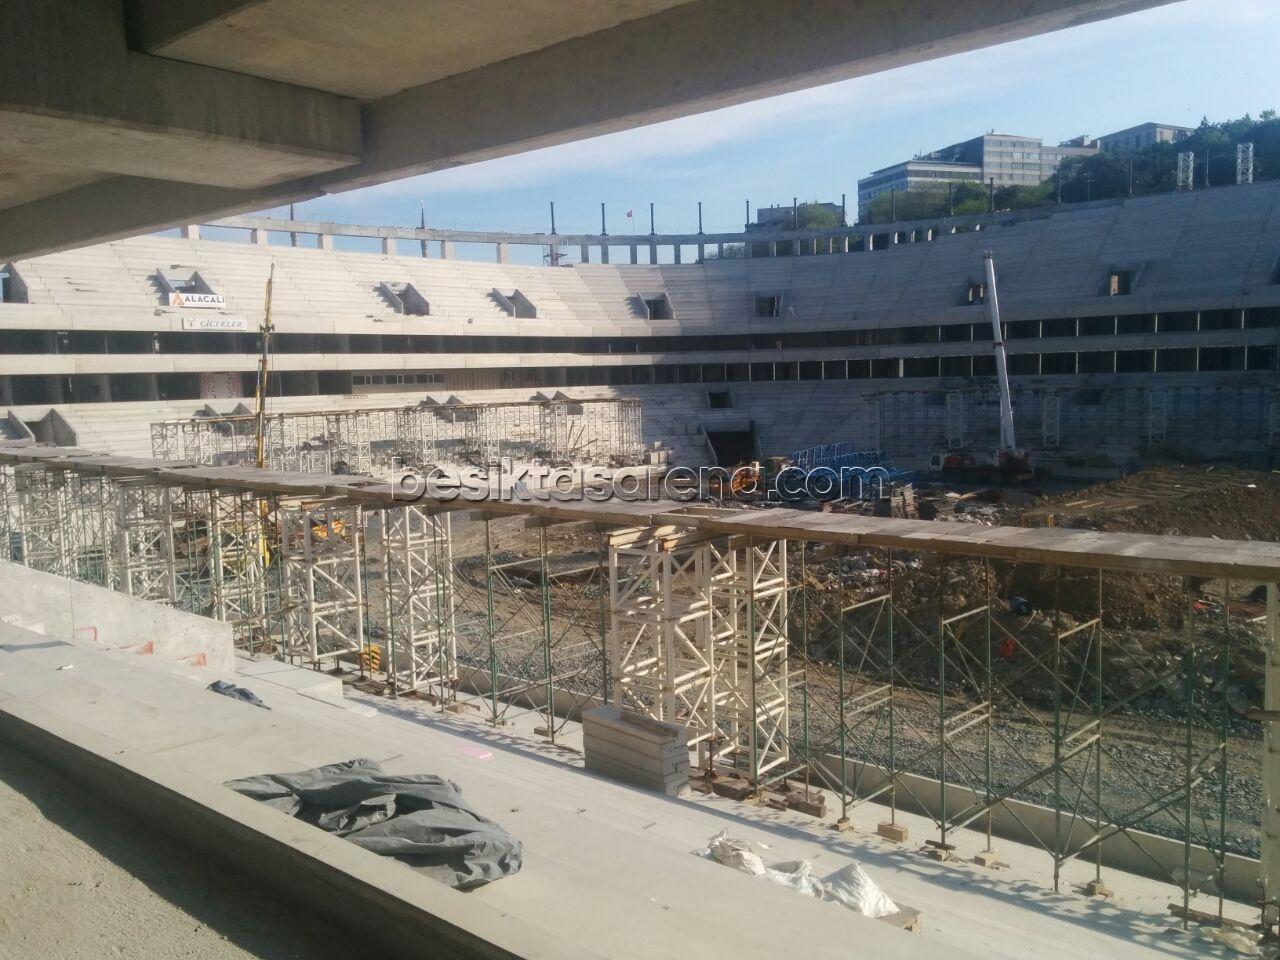 vodafone-arena-19.00-06-Mayıs-2015-10